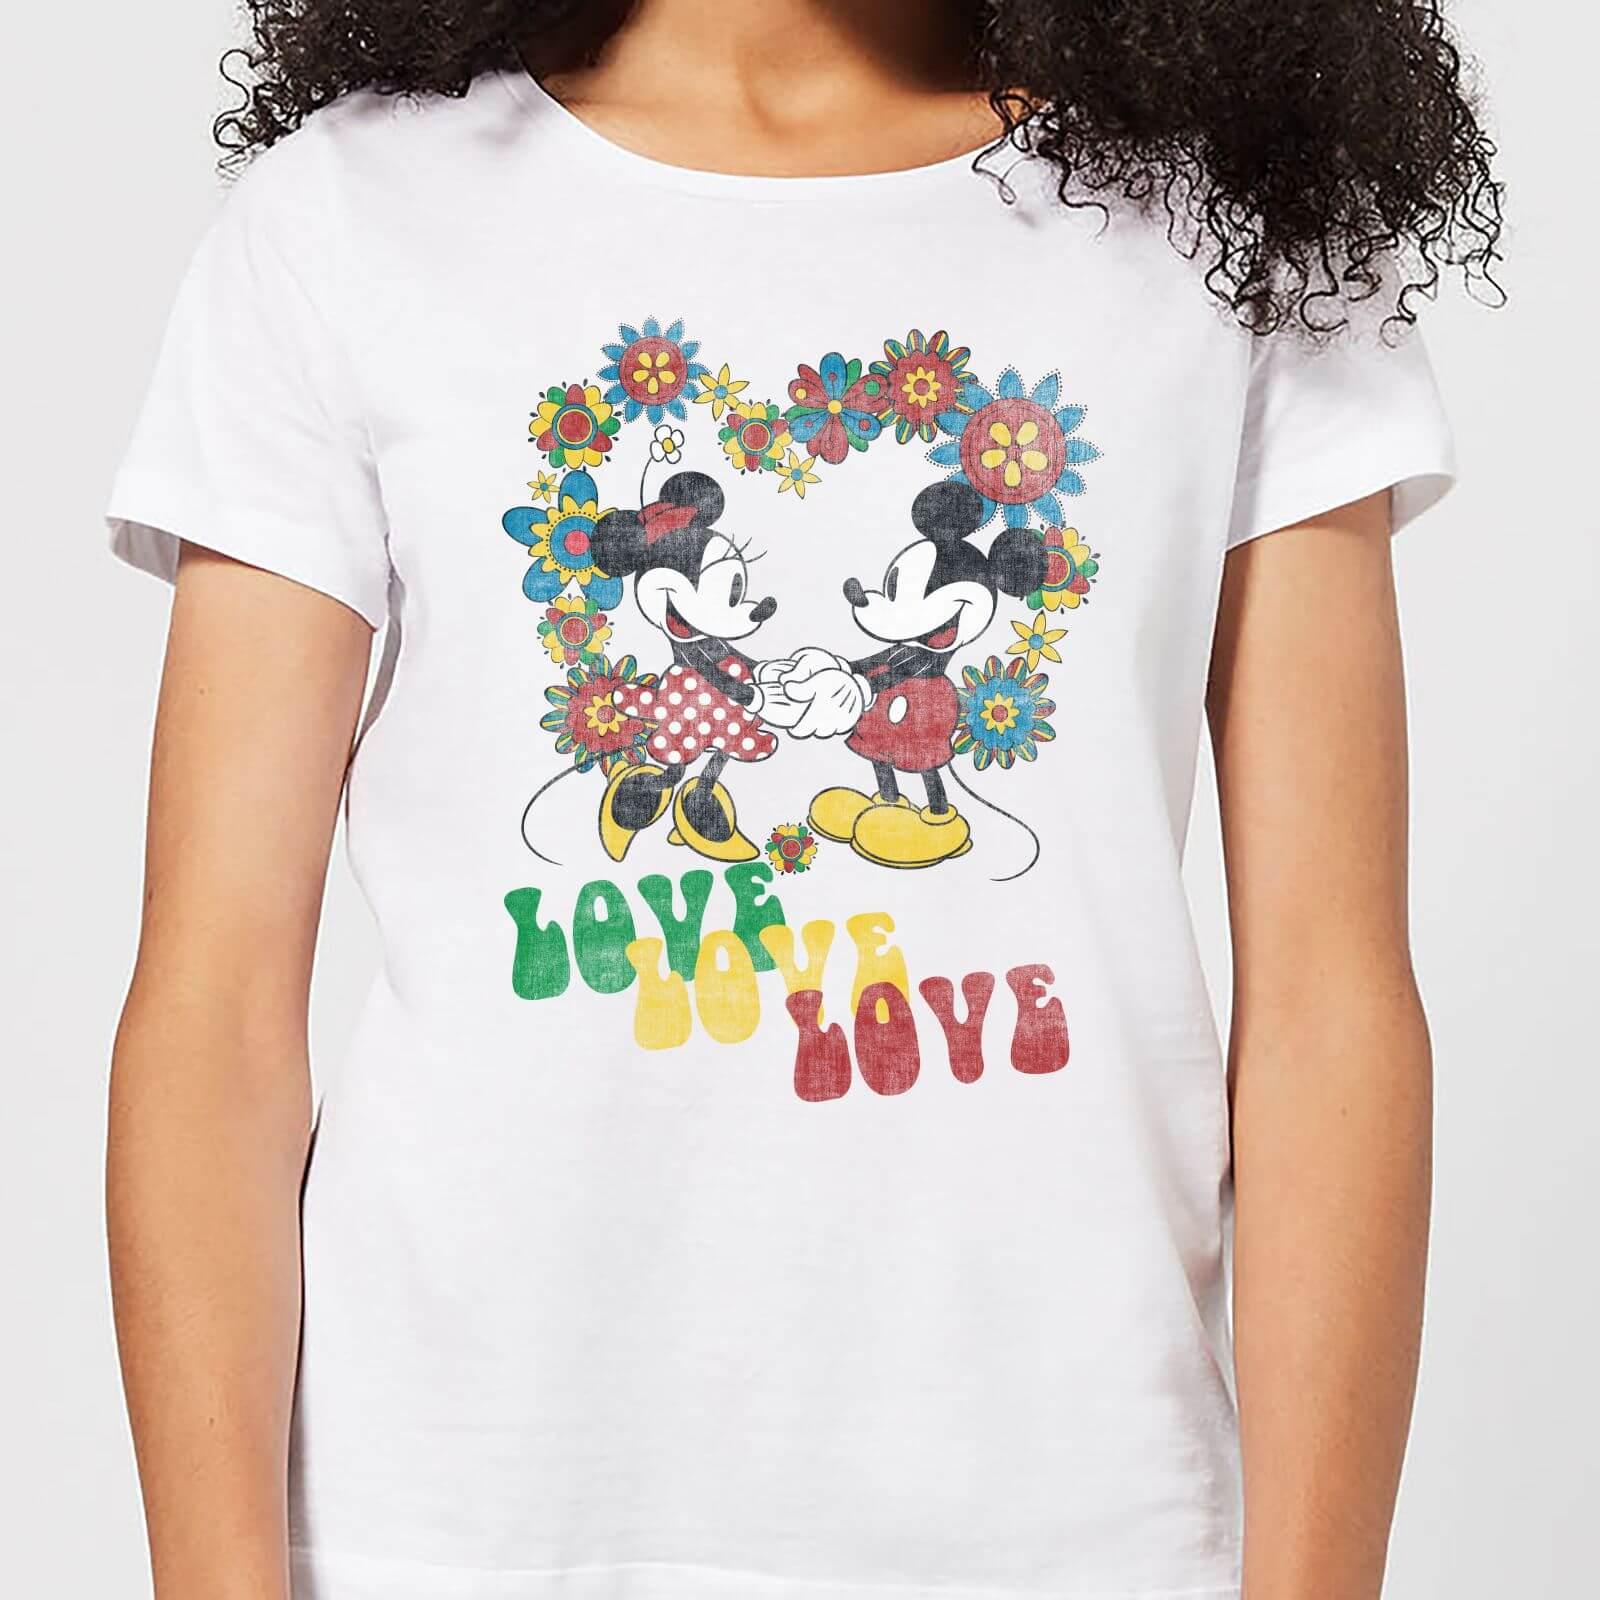 Disney Mickey Mouse Hippie Love Women's T-Shirt - White - 3XL - White